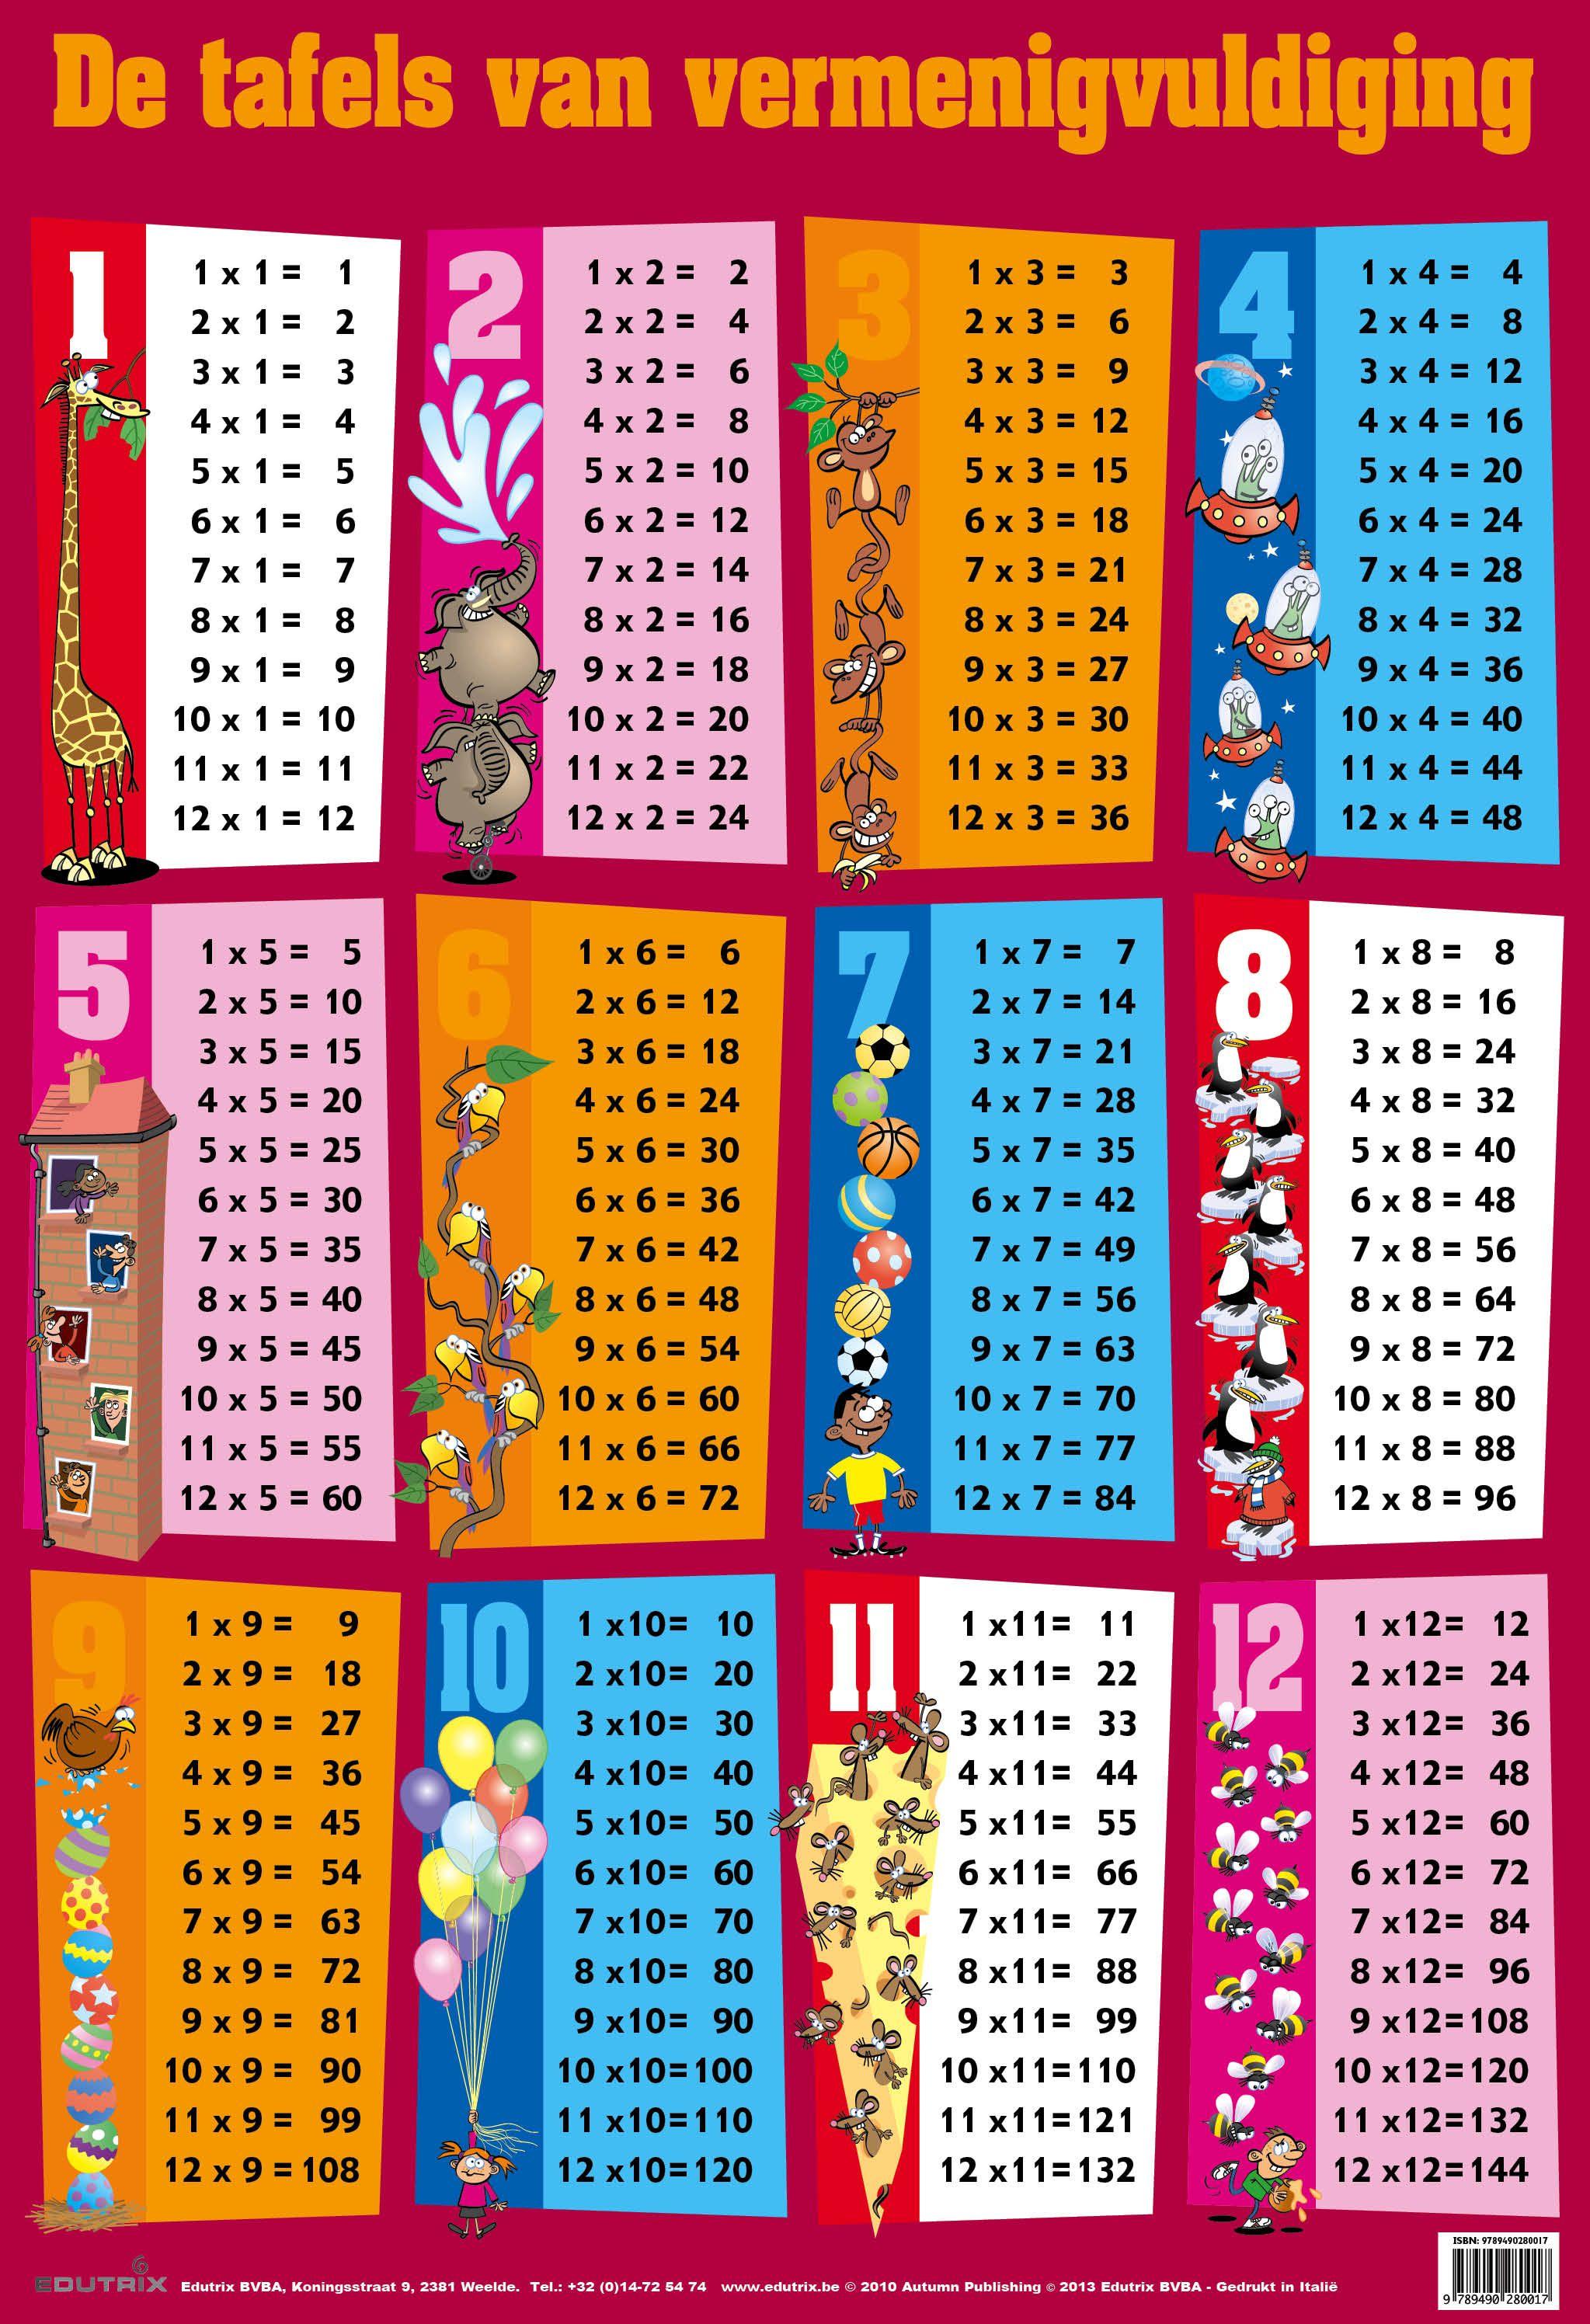 Poster De tafels van vermenigvuldiging   Tafels   Pinterest